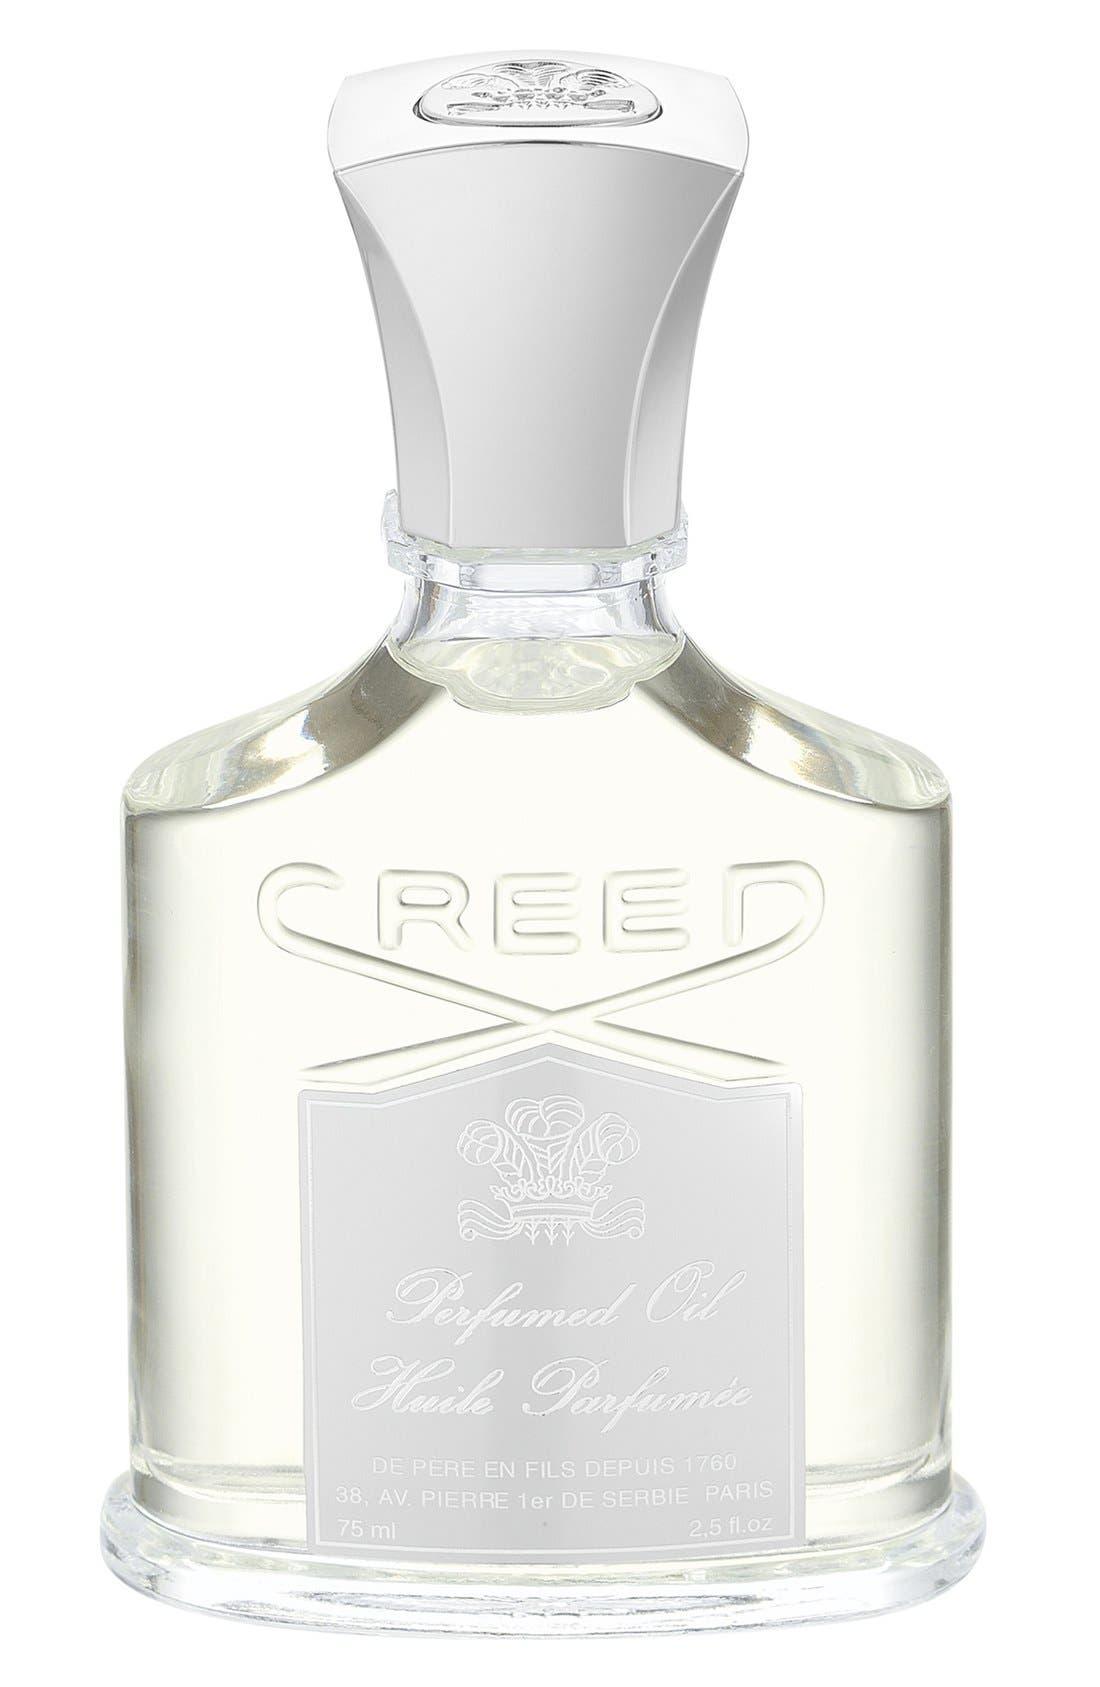 Creed 'Spring Flower' Perfume Oil Spray